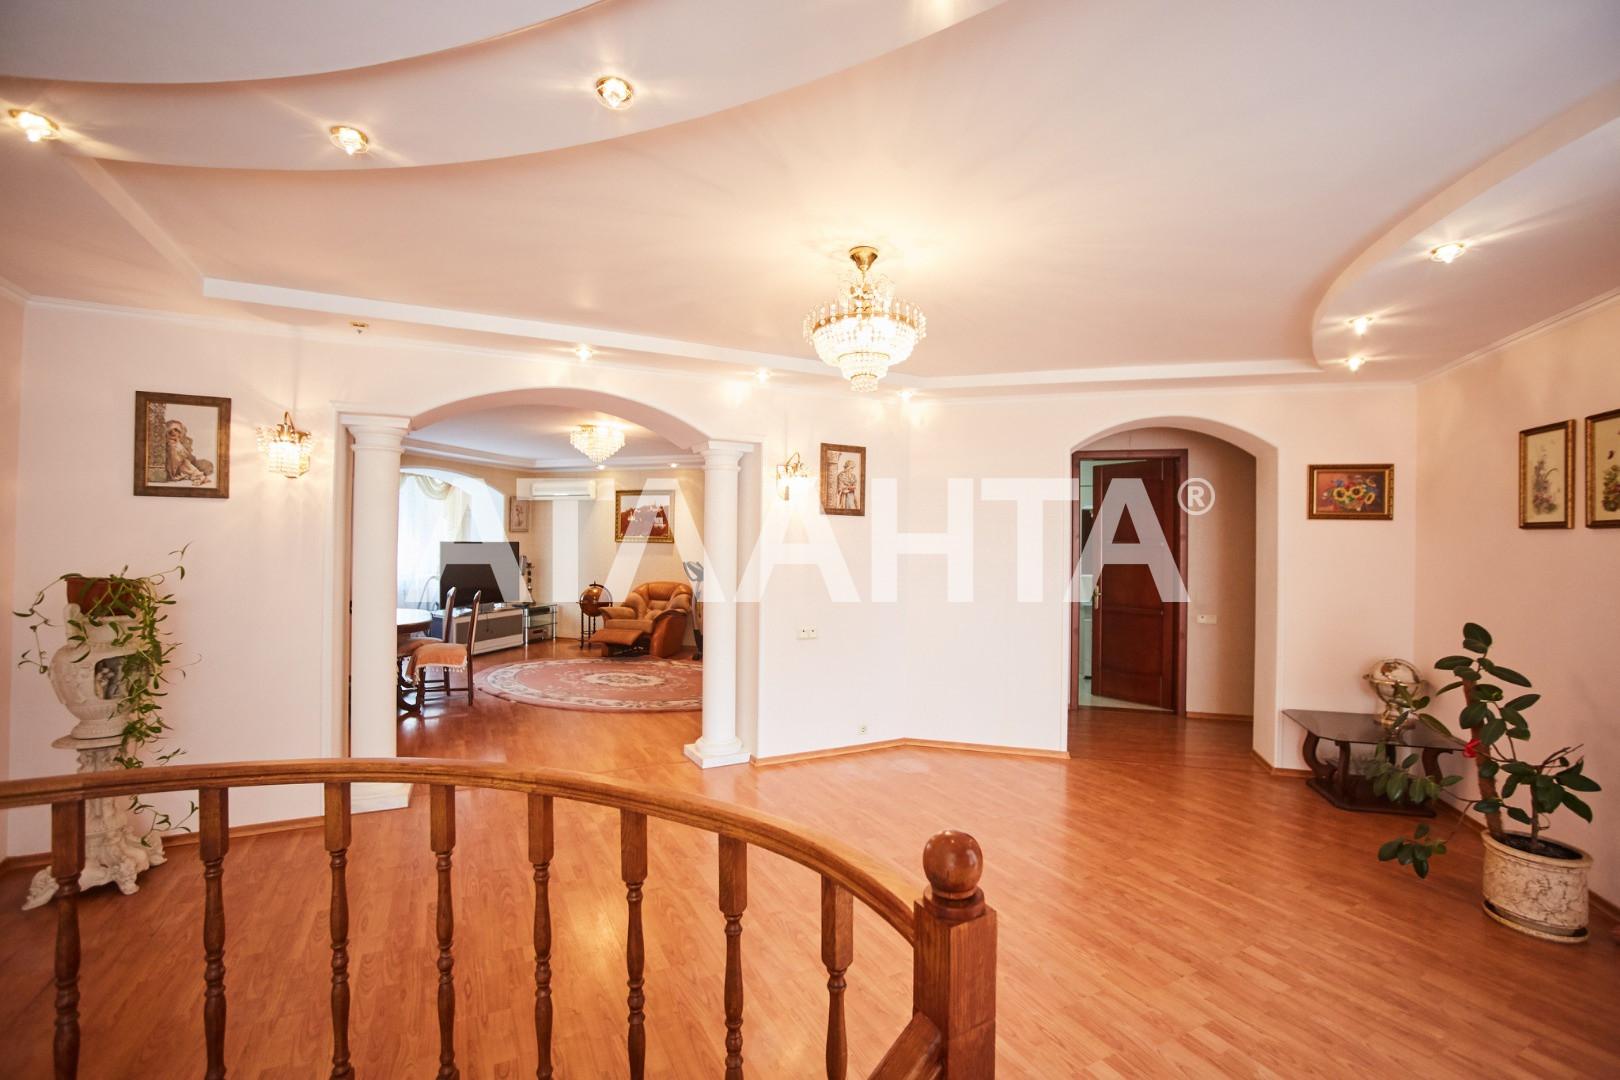 Продается Многоуровневая Квартира на ул. Посмитного — 295 000 у.е. (фото №16)